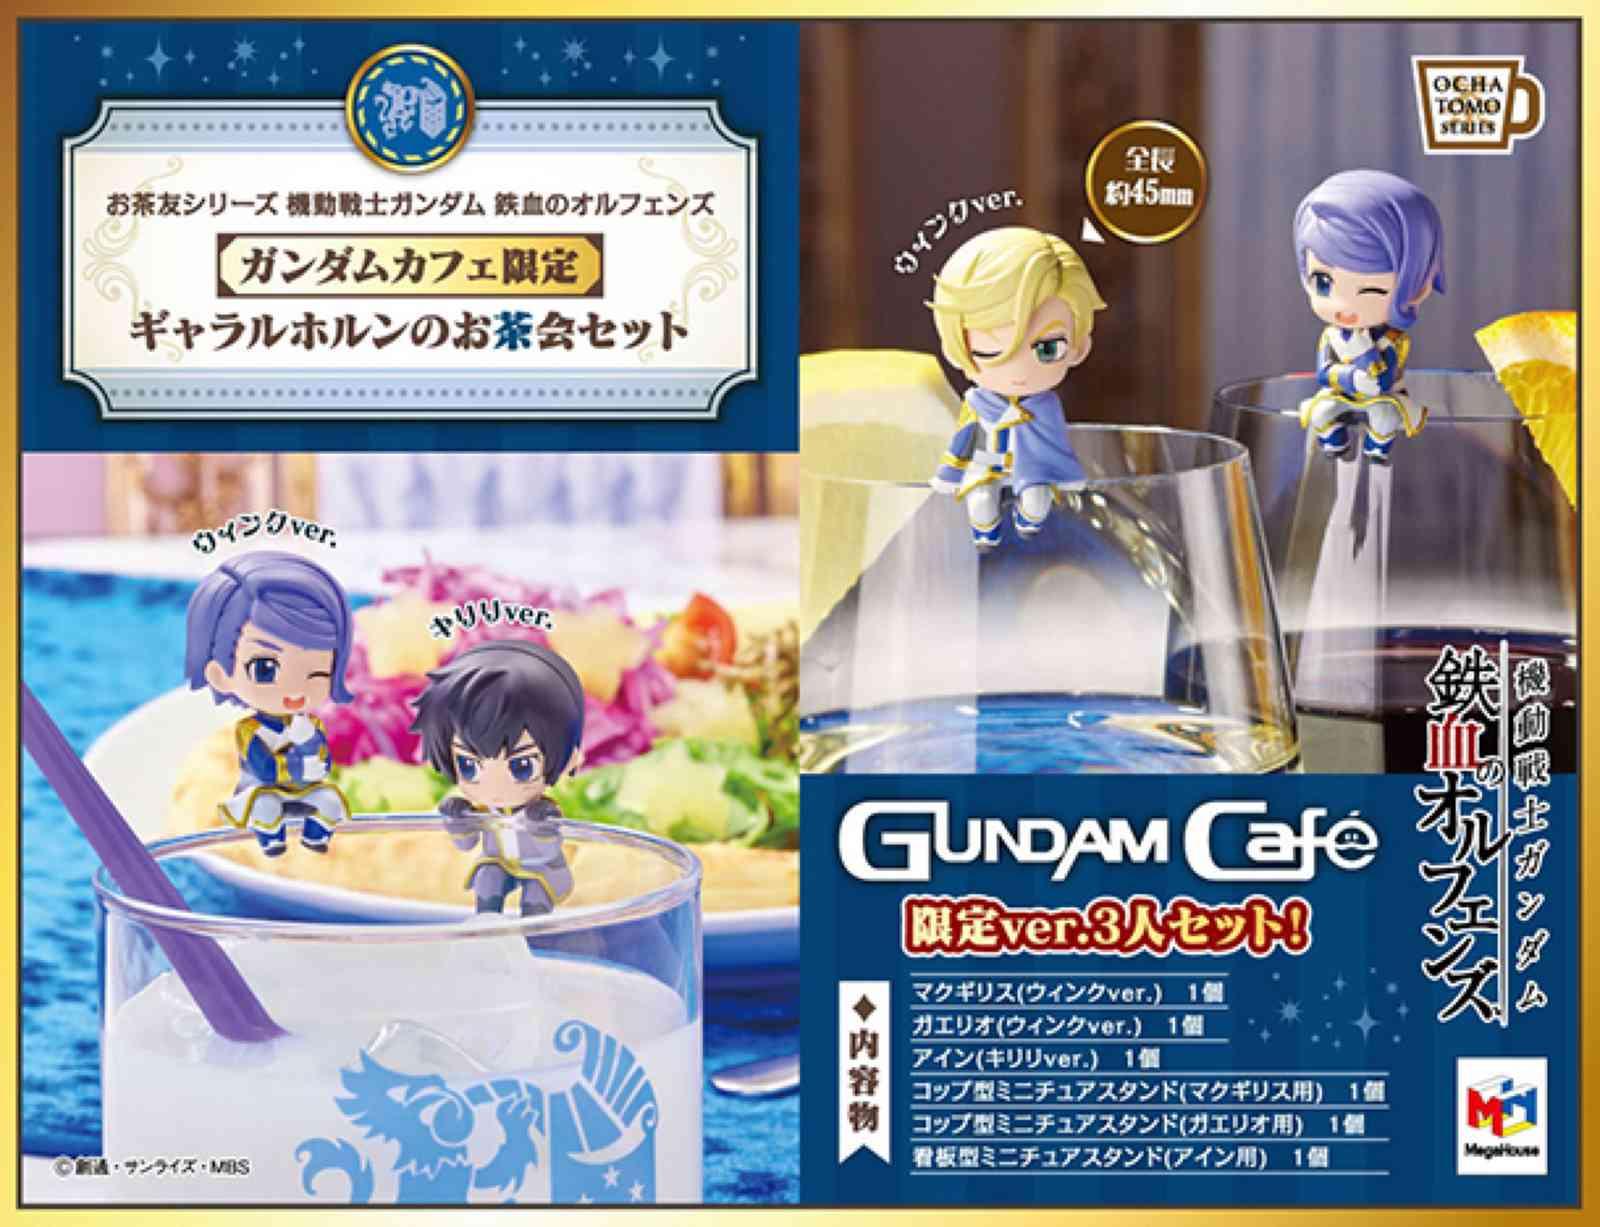 Gundam Café flyer (g-café.jp)